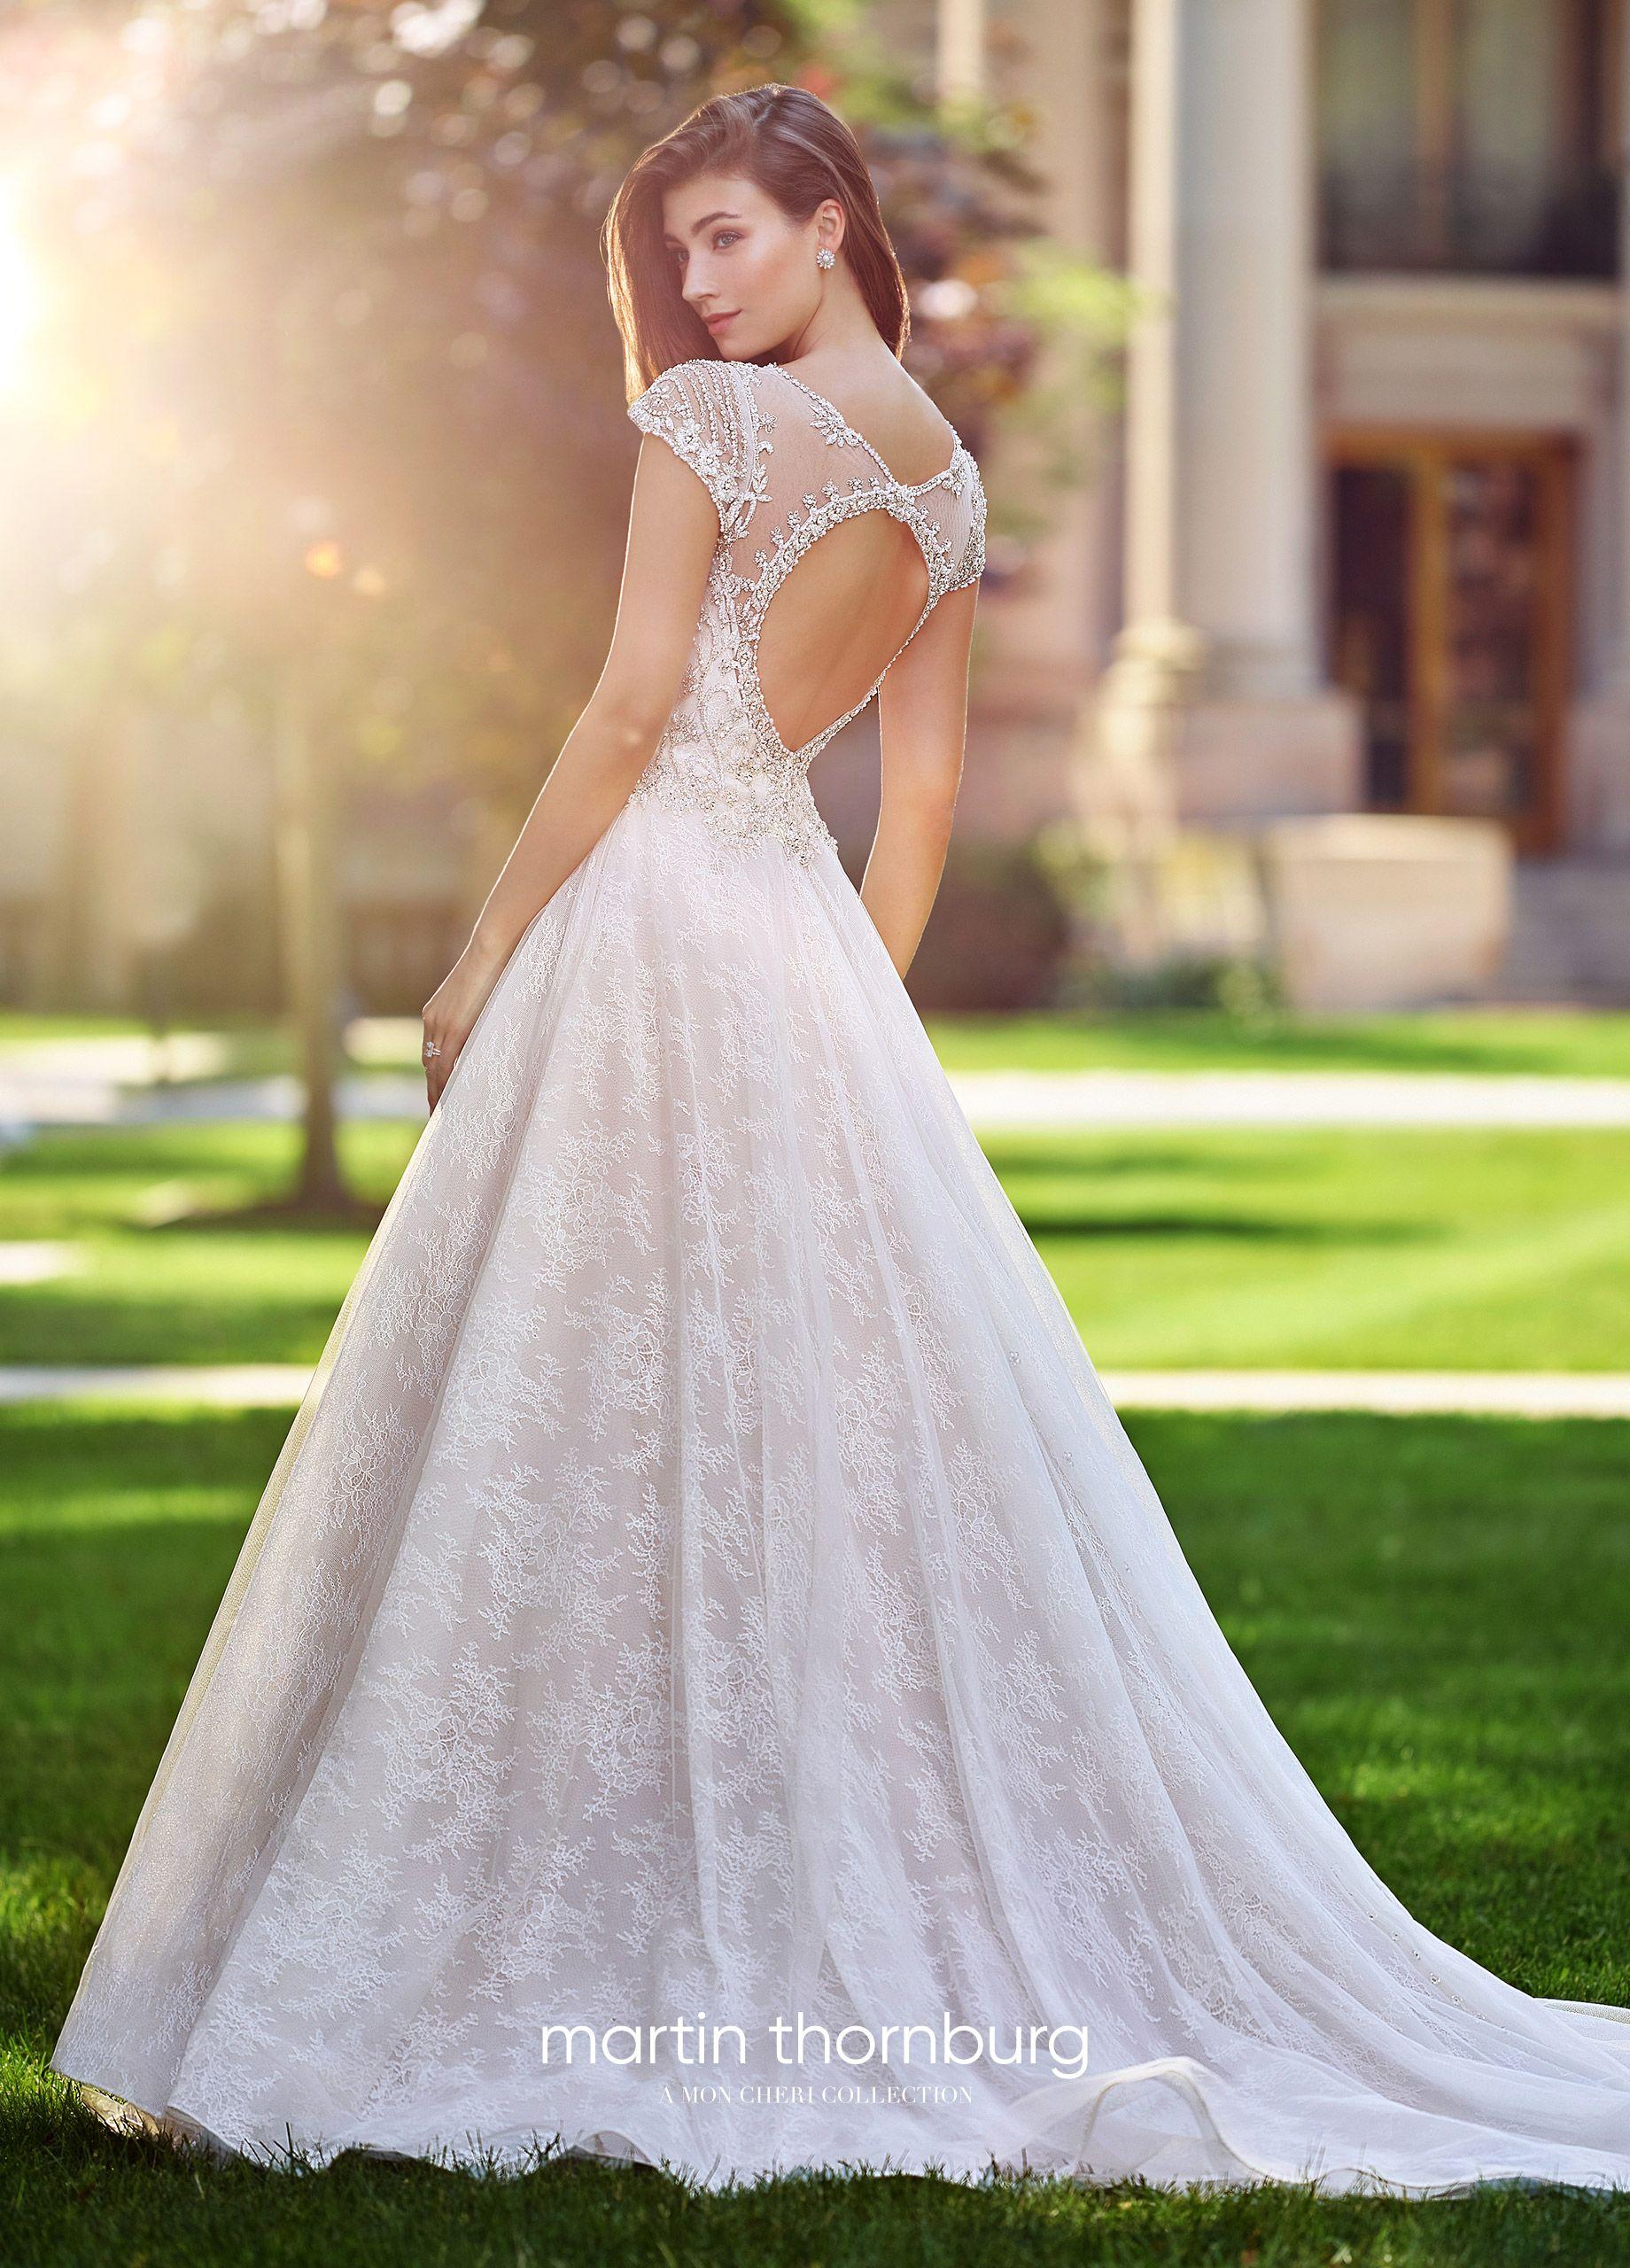 Unique wedding dresses fall martin thornburg latest